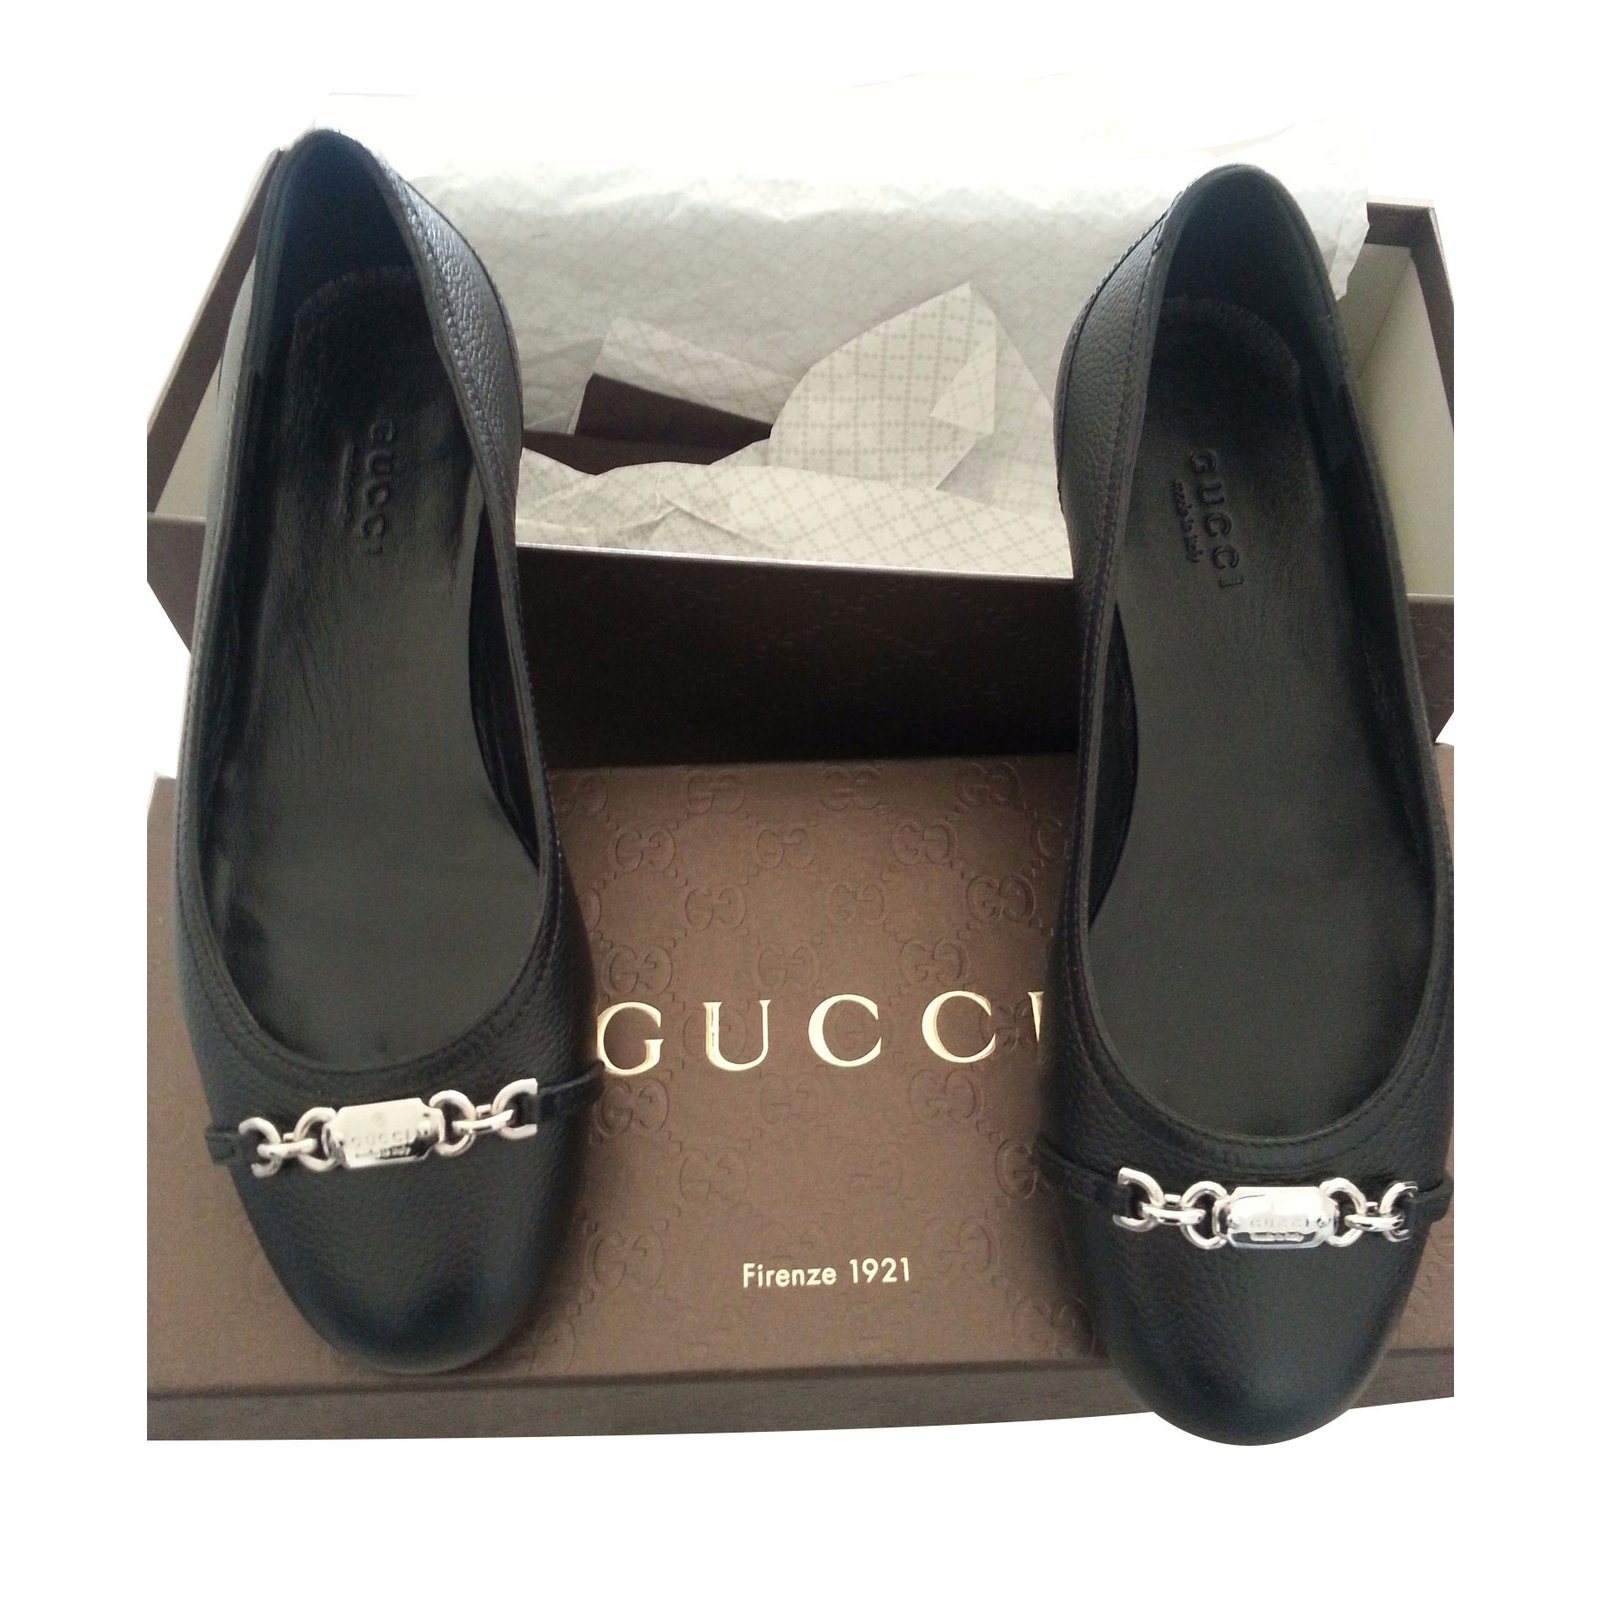 Gucci Ballet flats Ballet flats Leather